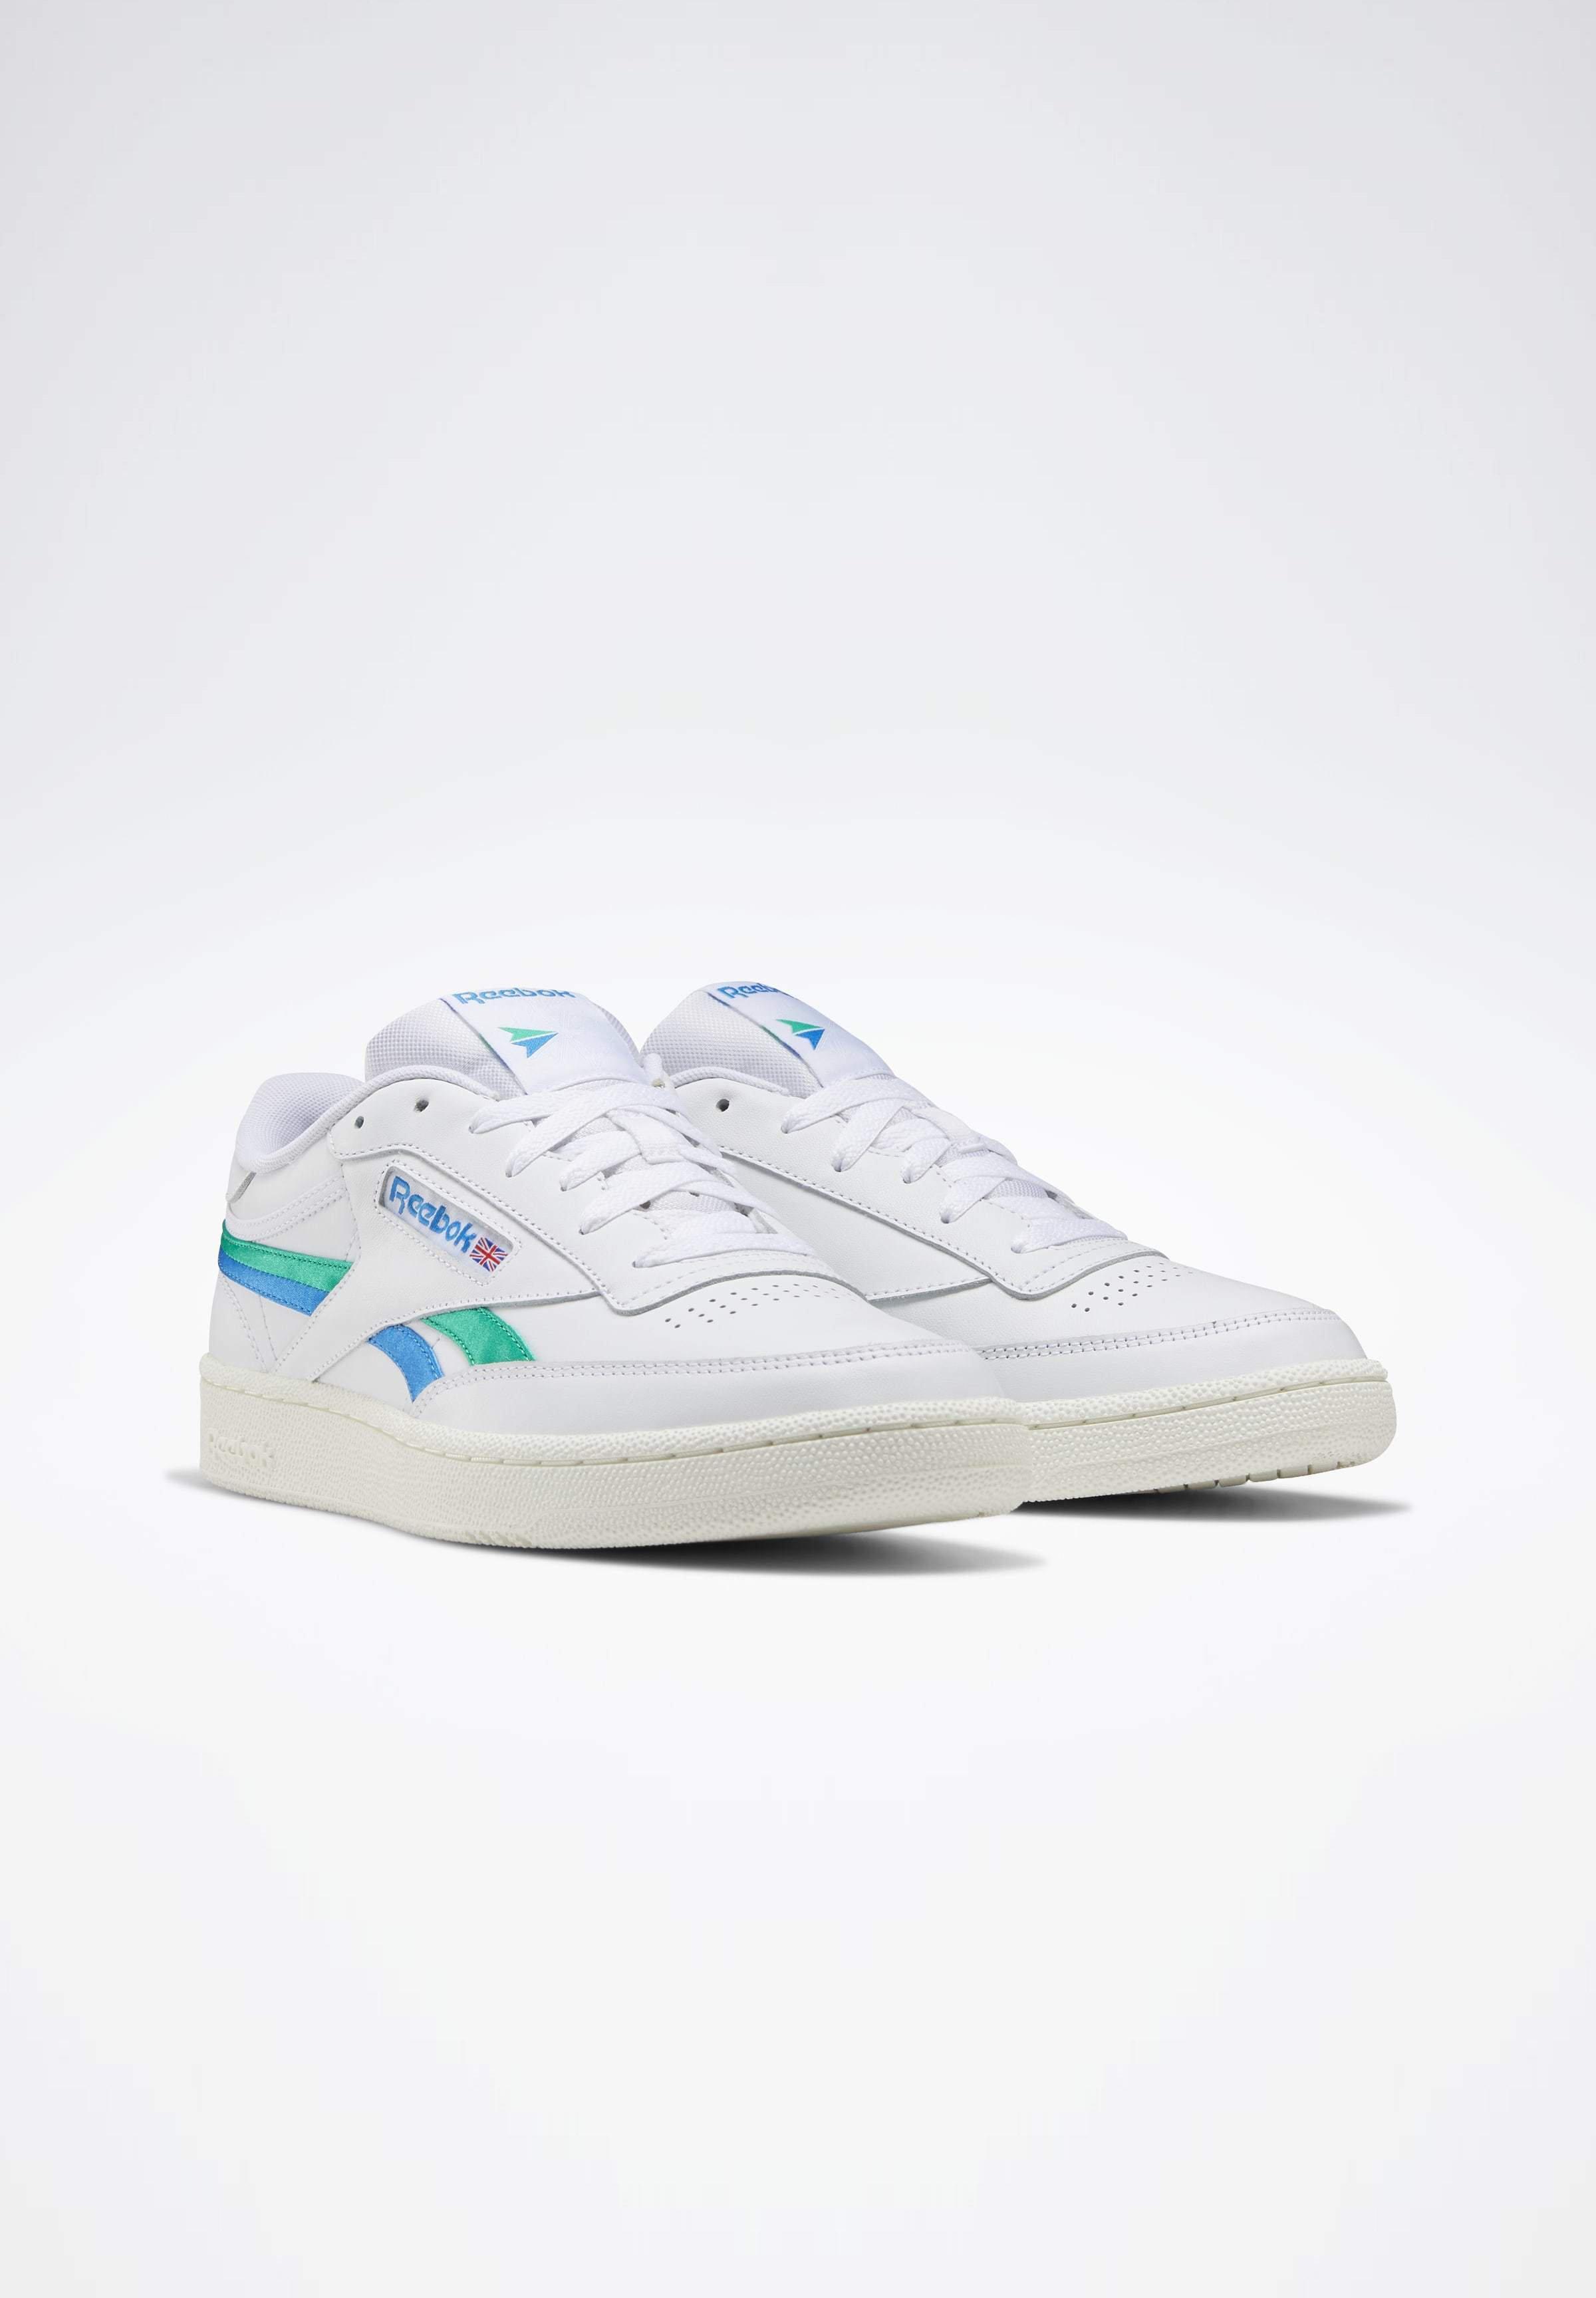 Reebok Classic Club C Revenge Shoes - Sneakers Laag White Goedkope Schoenen